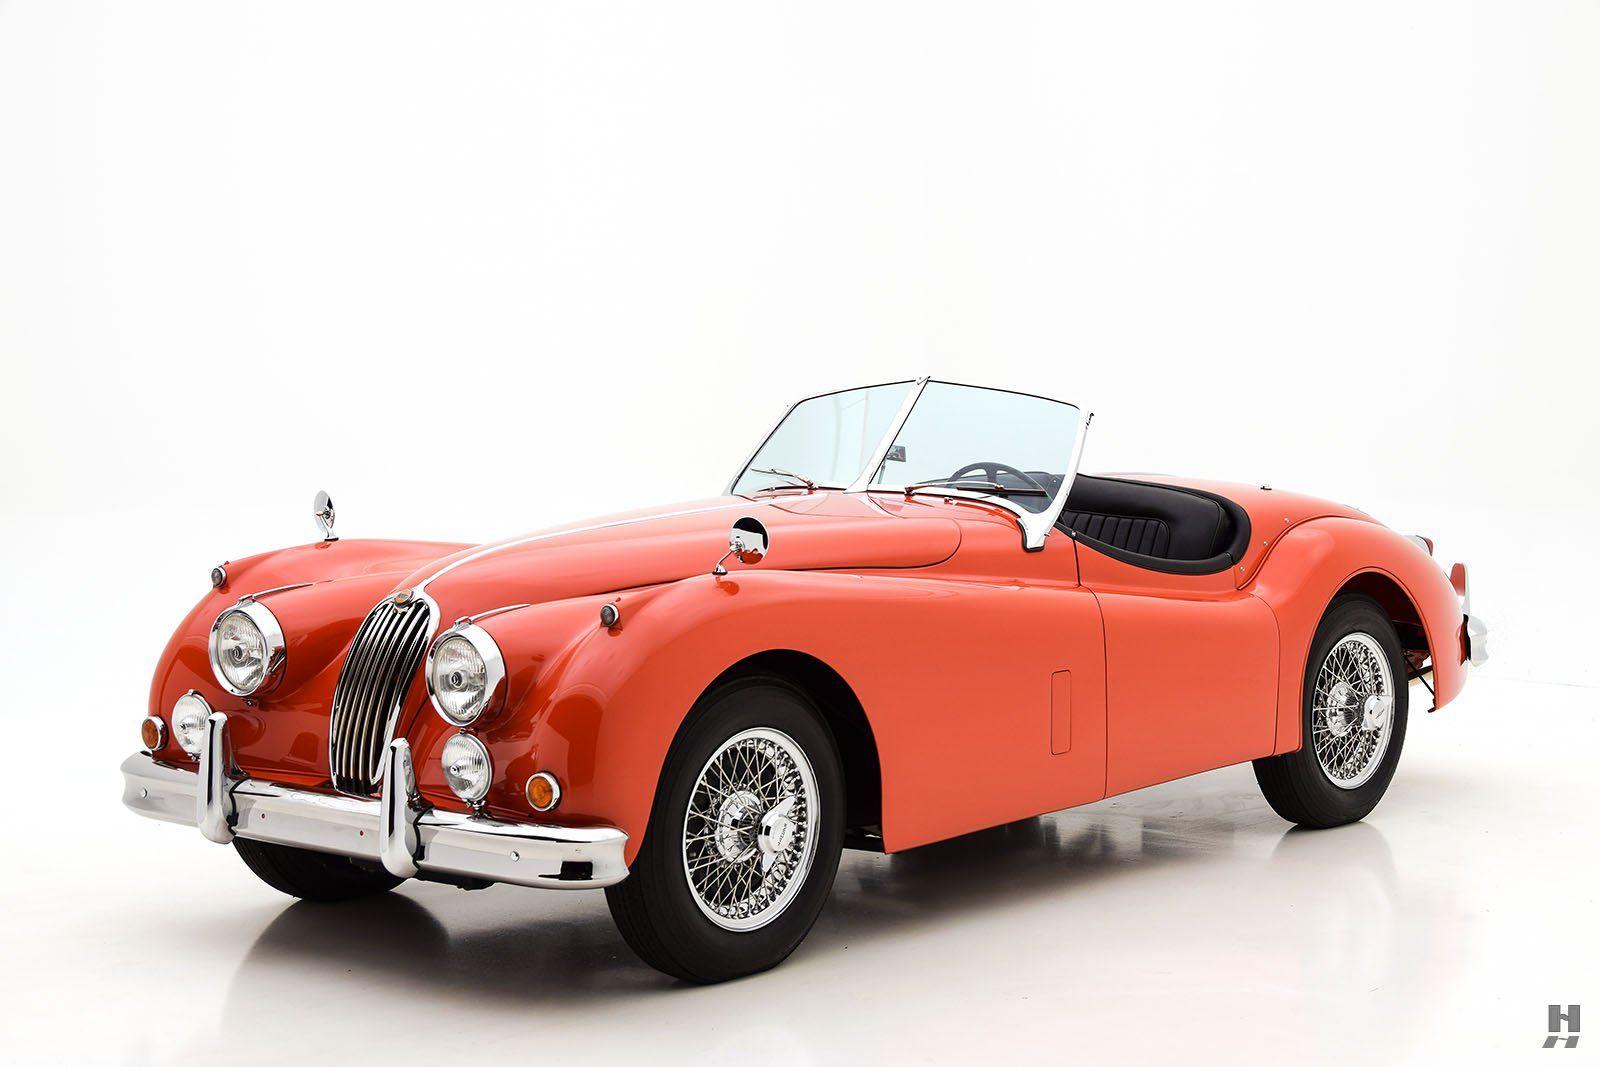 1955 Jaguar XK 140 M Roadster | Hyman Ltd. Classic Cars | 0ld cars ...